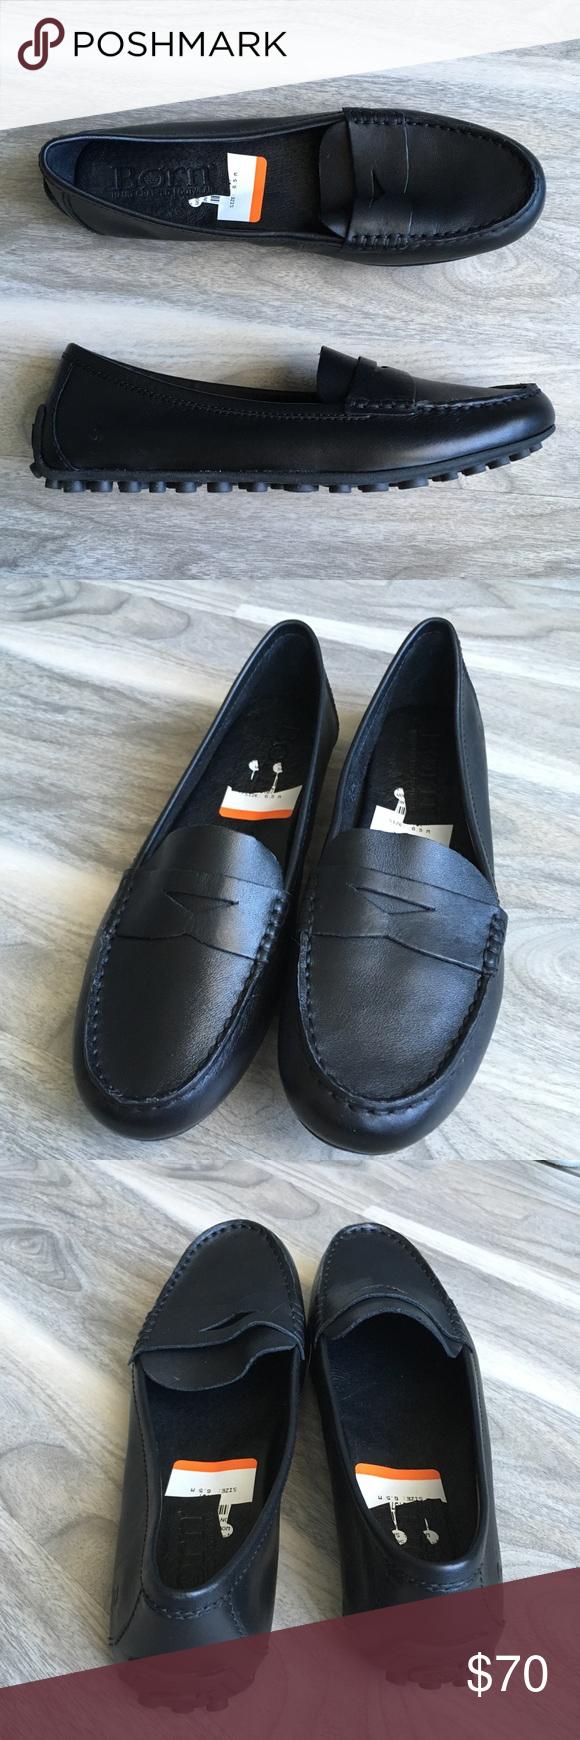 32da61b7b95 Born Malena black leather loafers 6.5 nwt Born Malena black leather loafers  6.5 nwt. Gorgeous ! Super comfortable